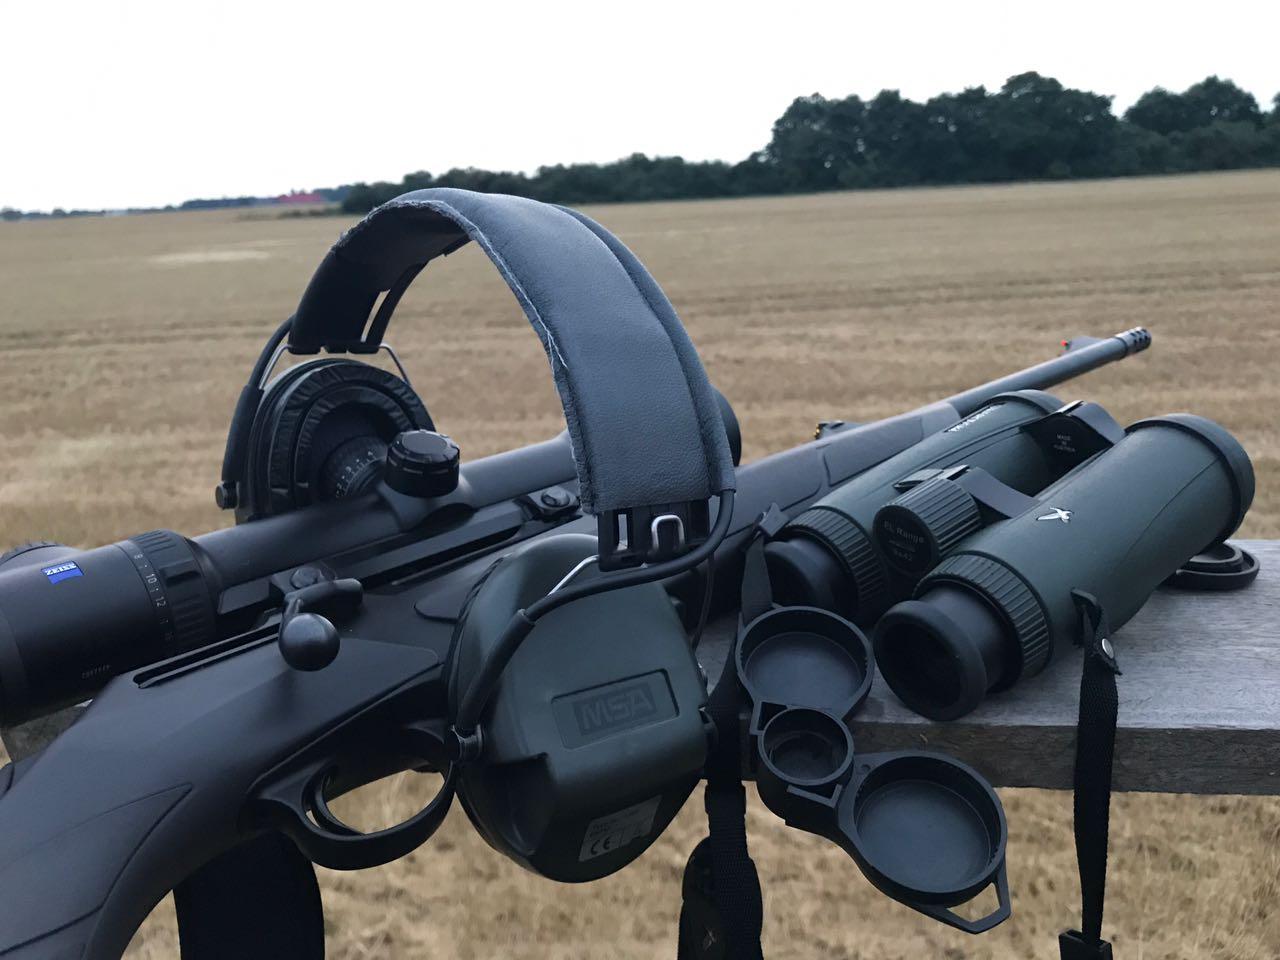 Entfernungsmesser Jagd Forum : Jagdausrüstung für jungjäger jagdprinz